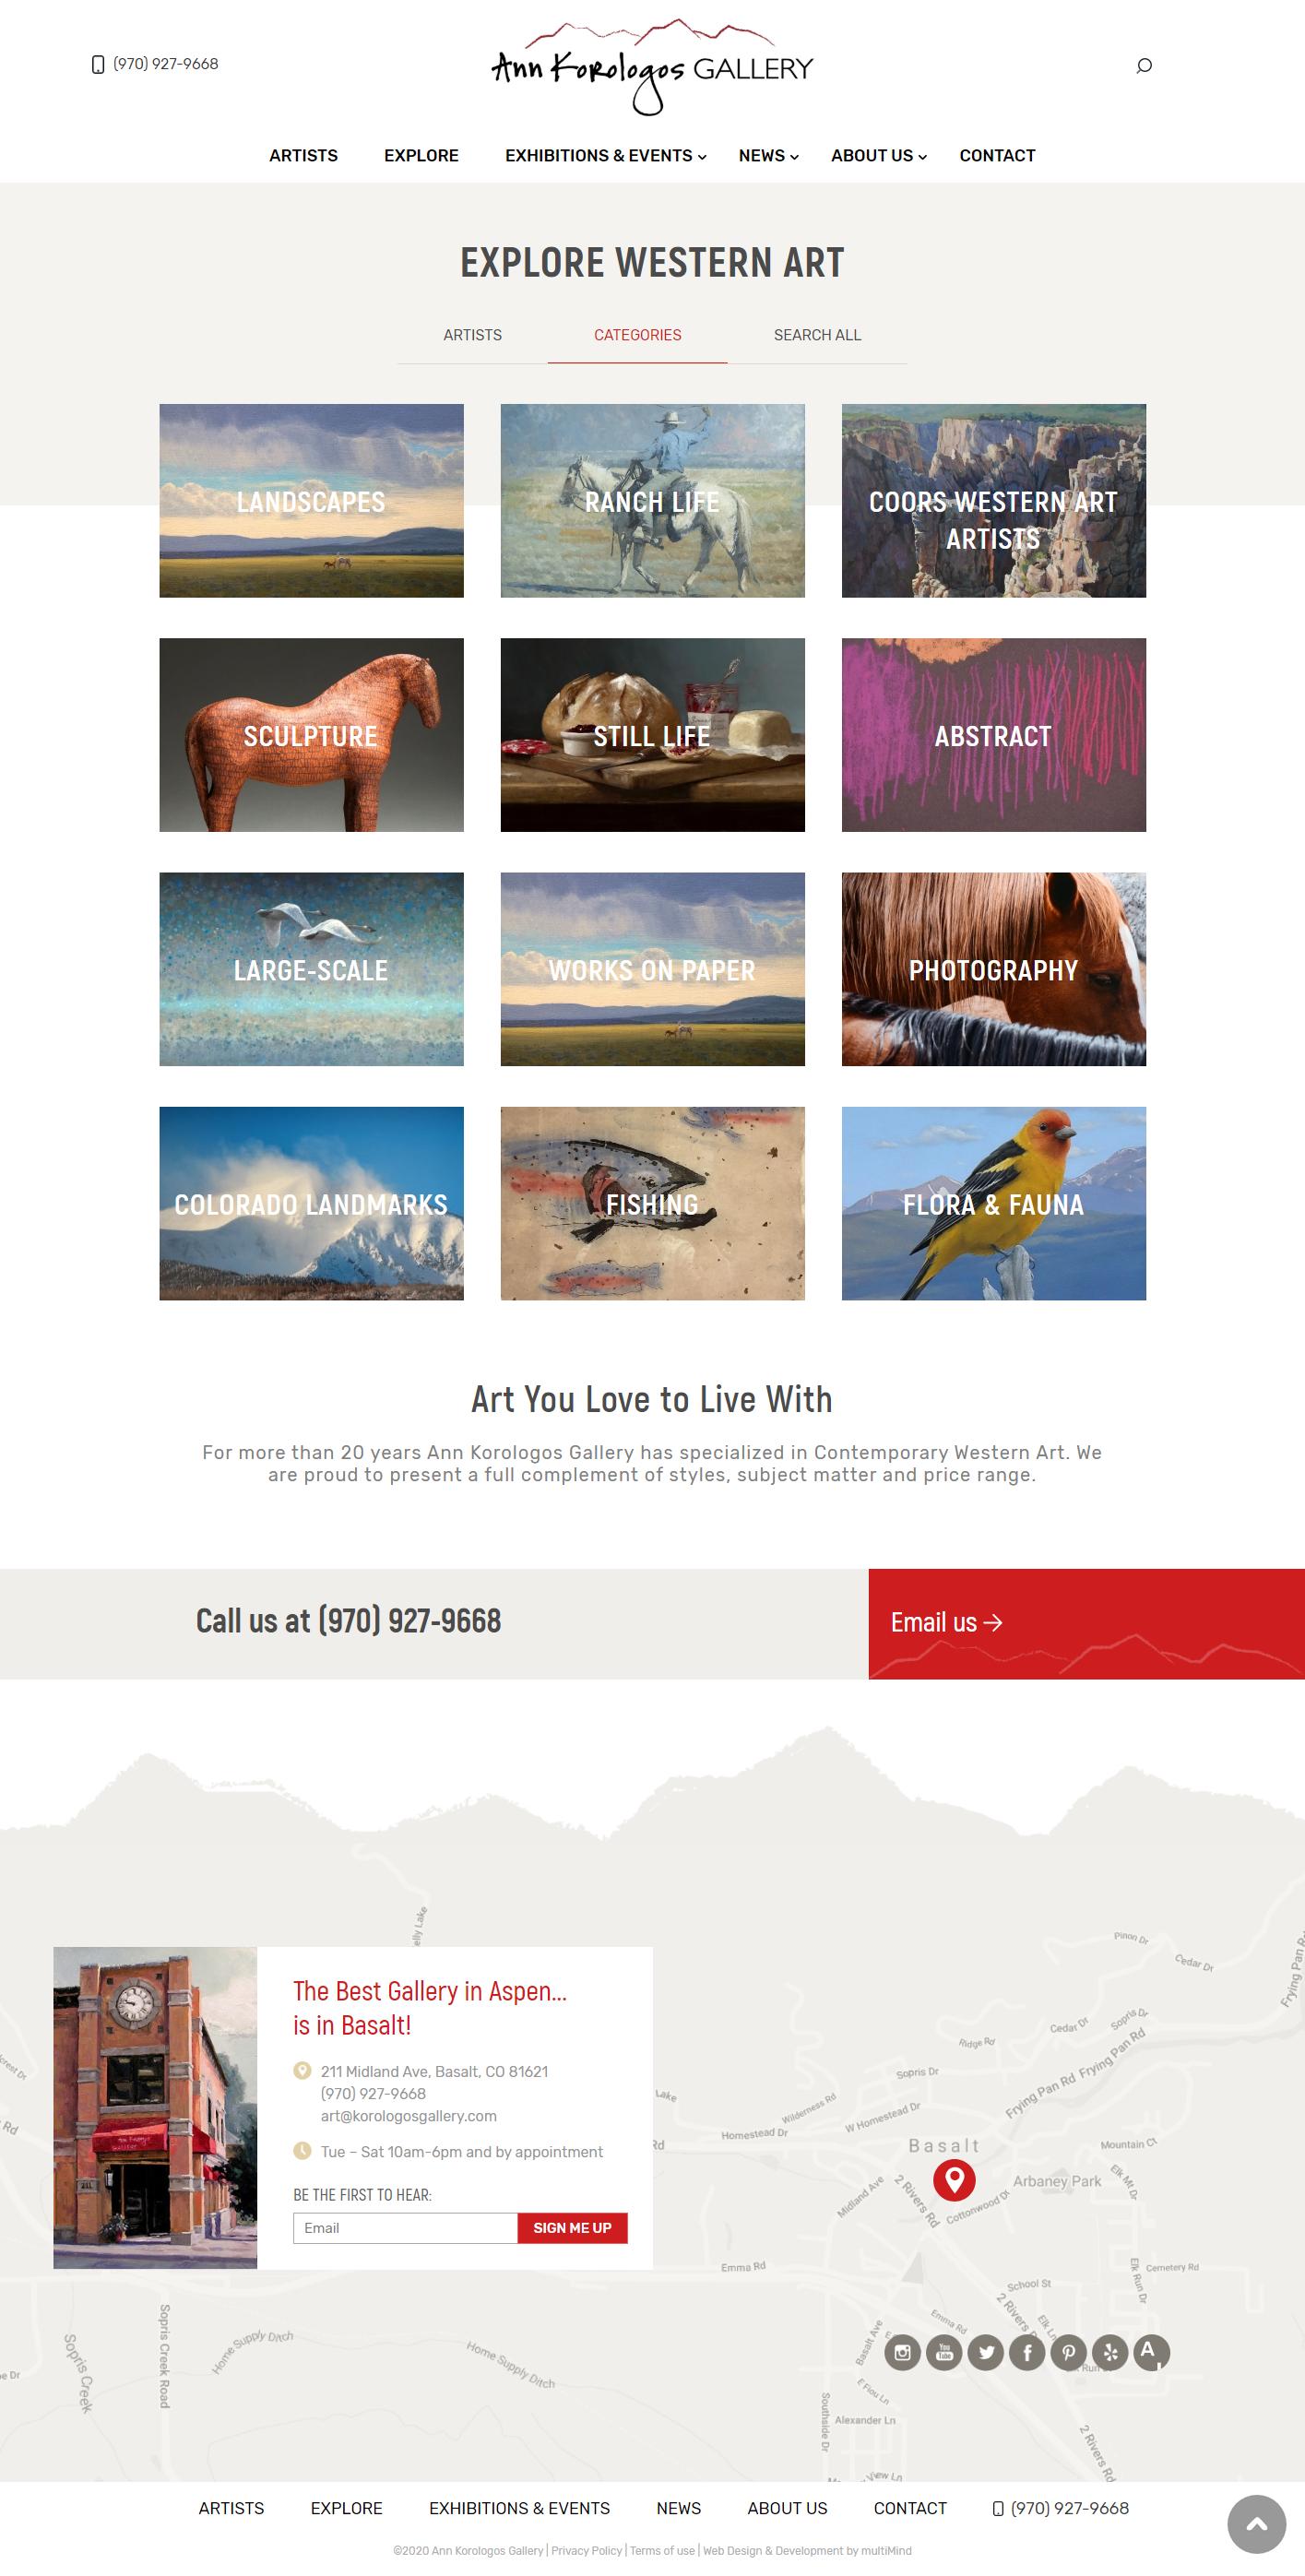 Ann Korologos Gallery website, explore western art